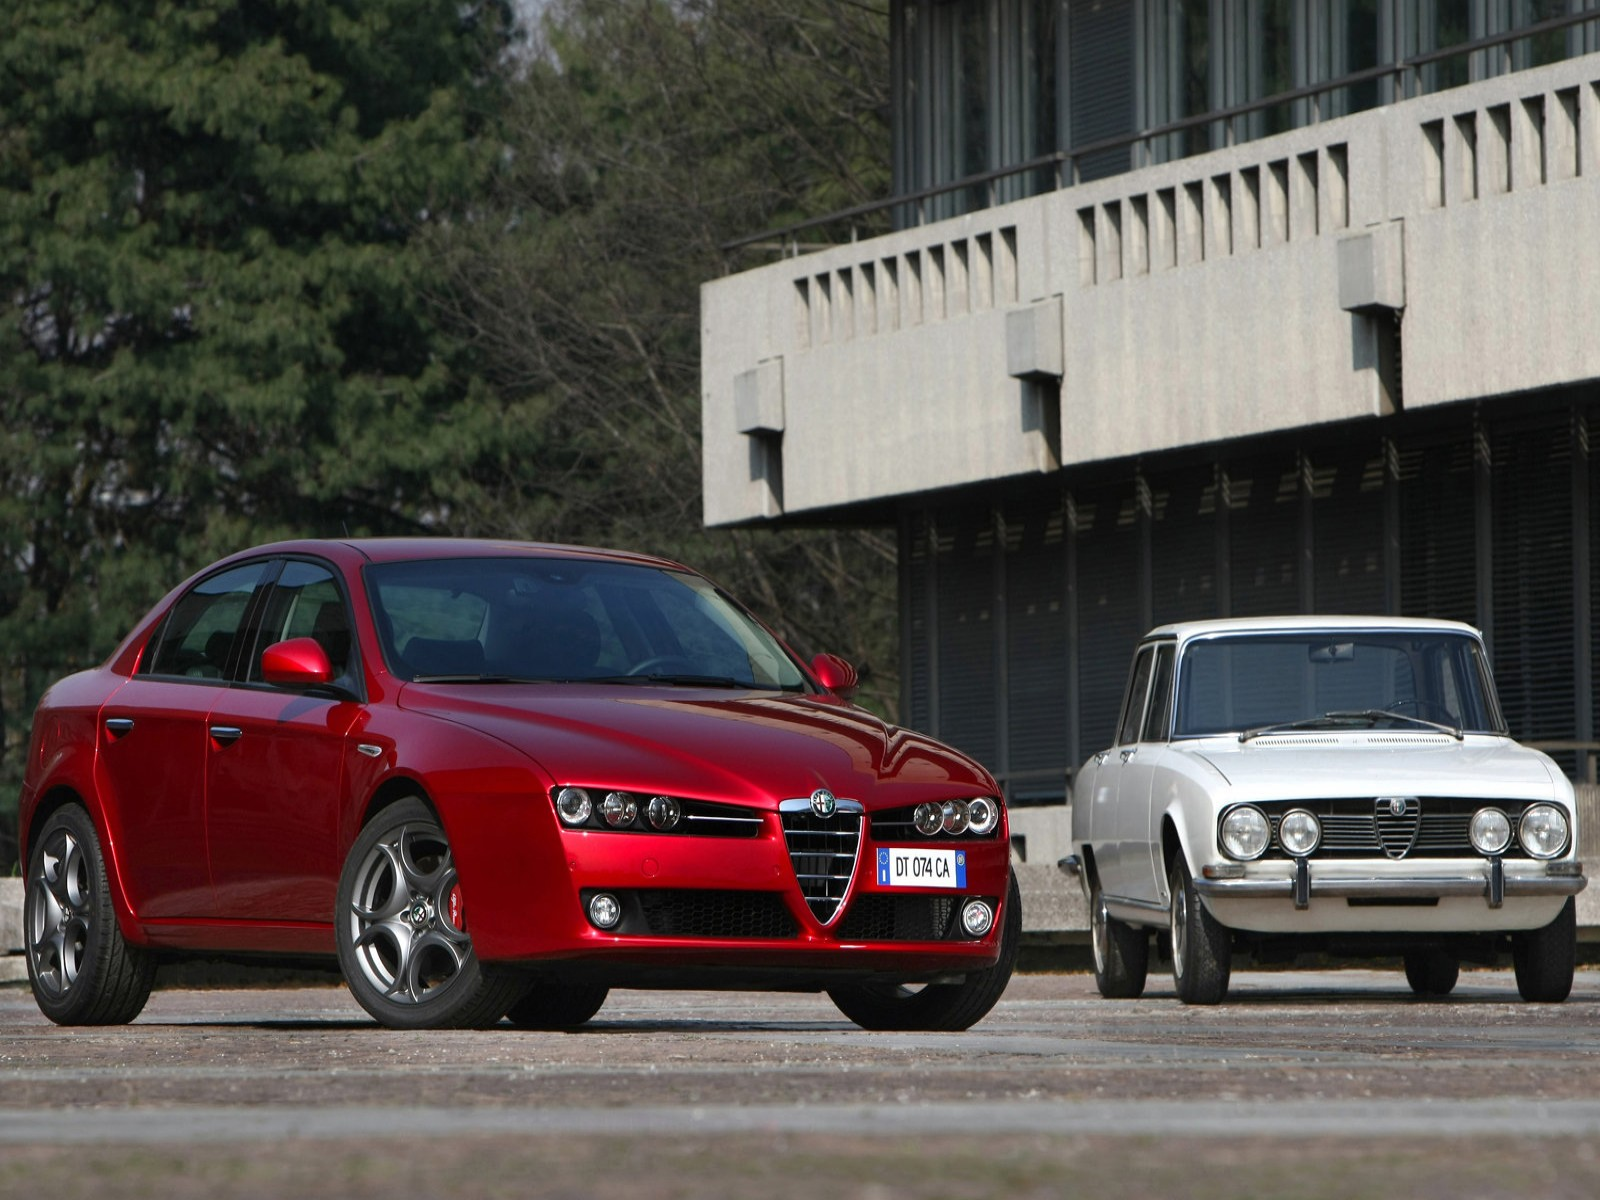 2010 Alfa Romeo 159 1750 TBi CAR WORLD